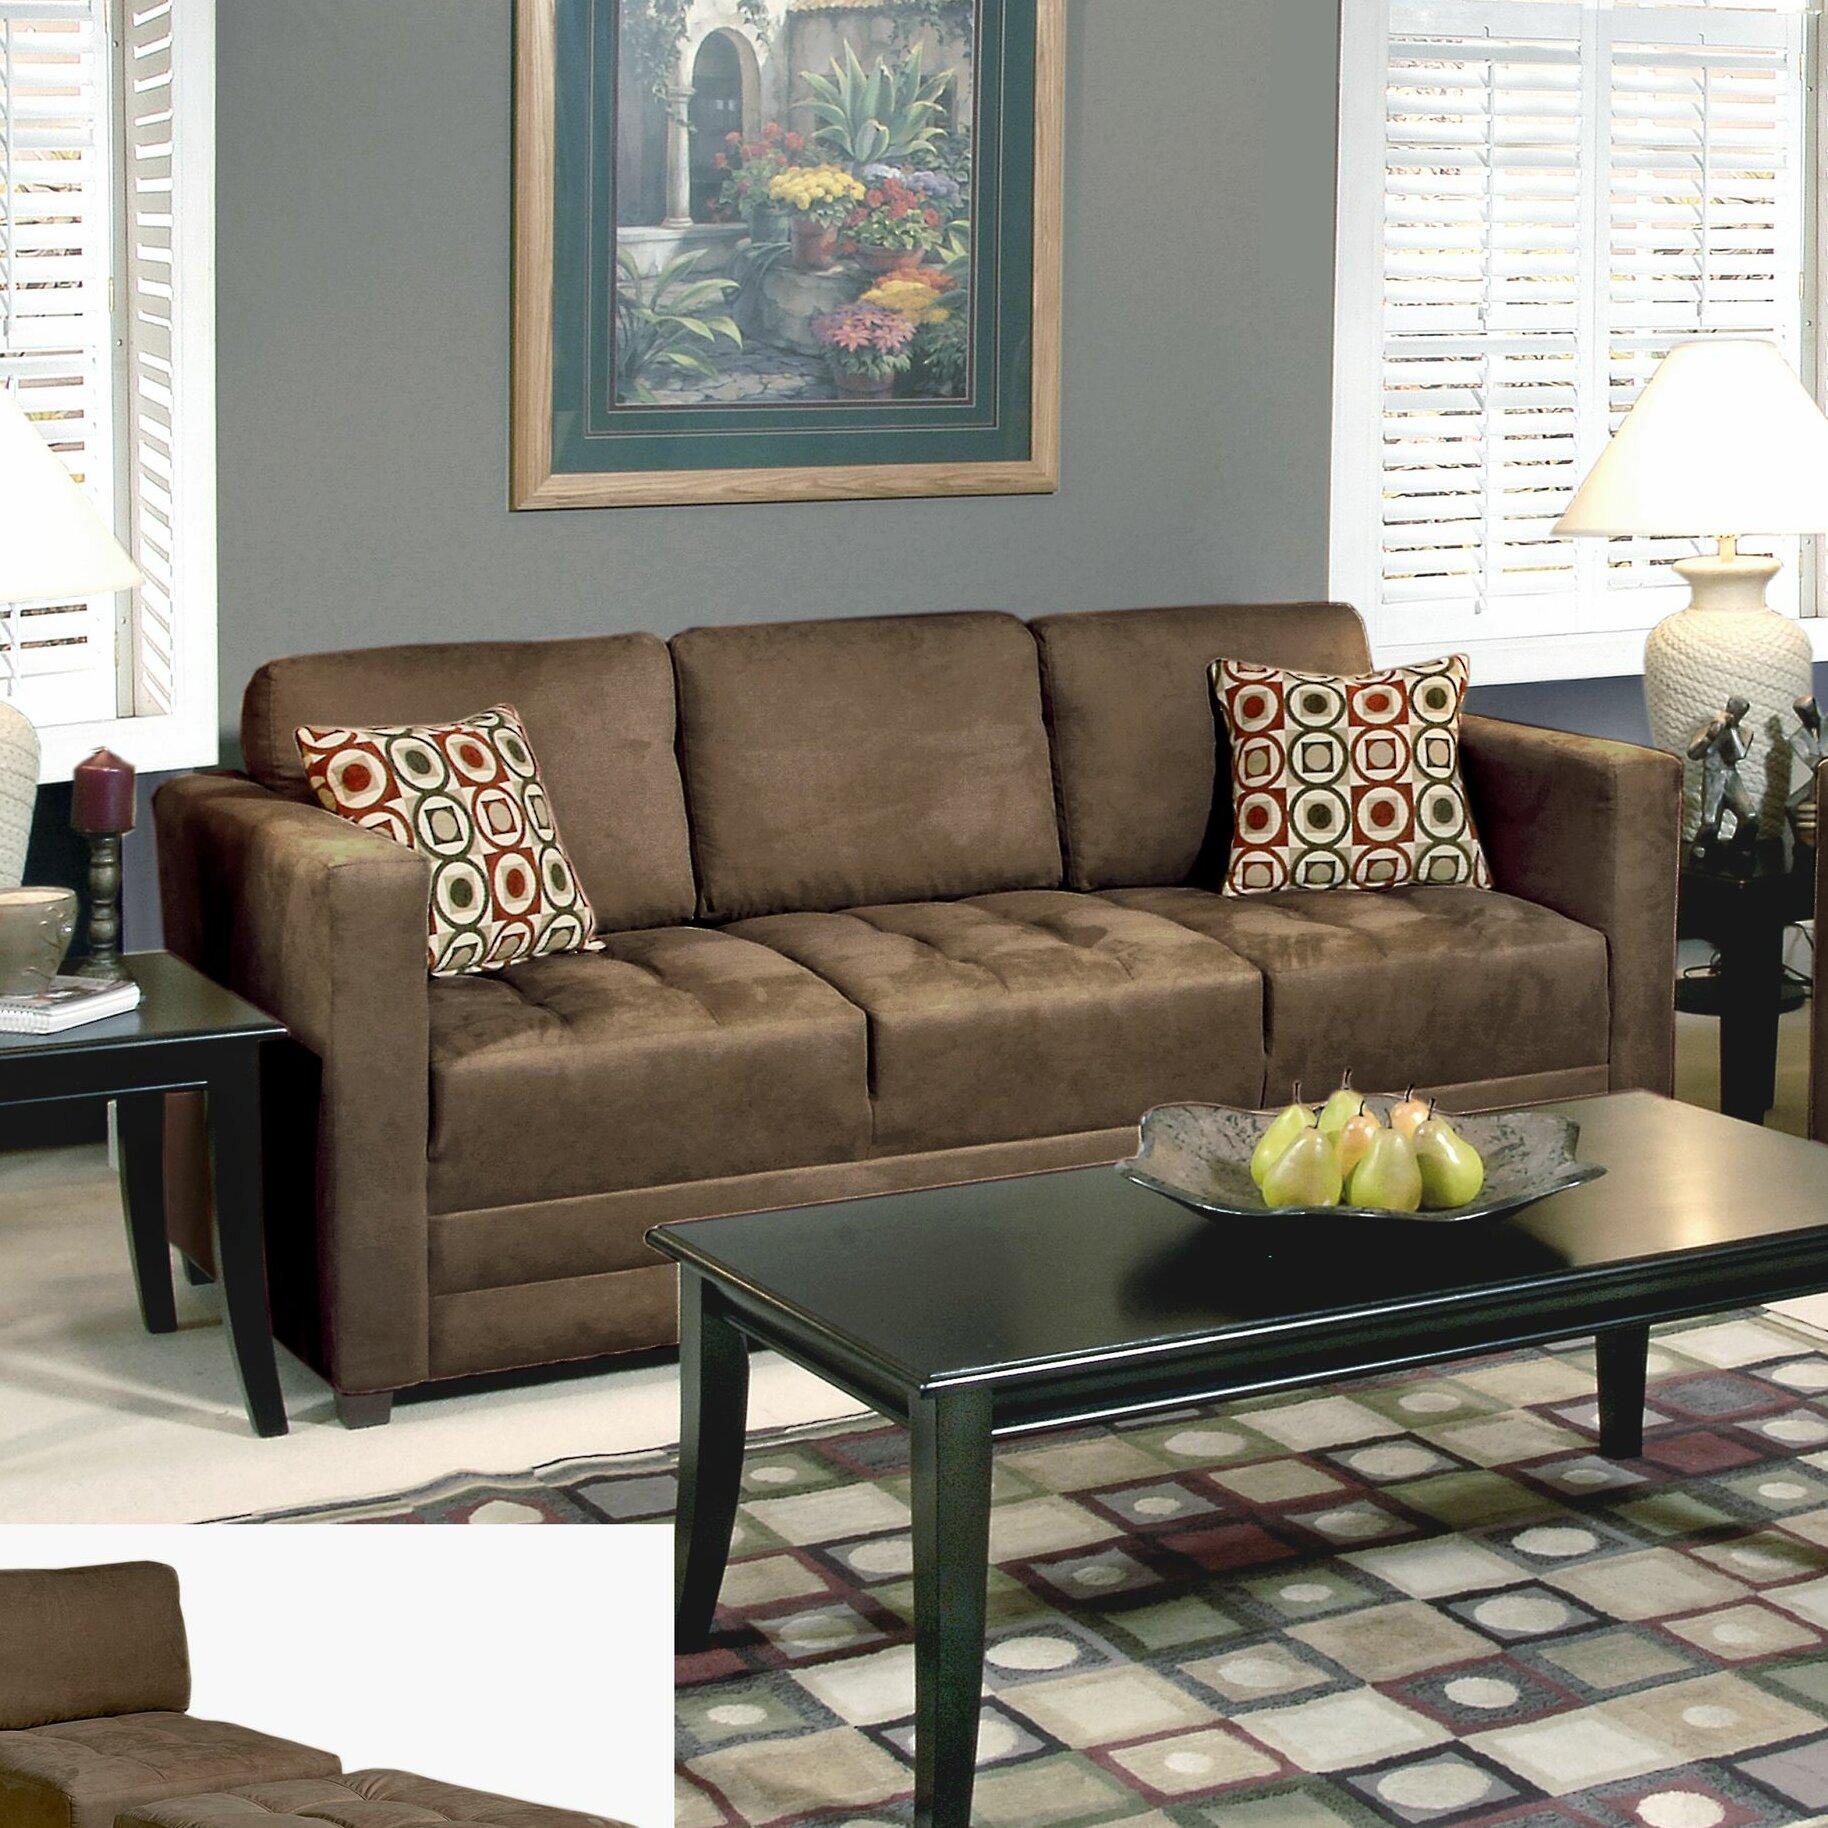 Latitude run serta upholstery sofa